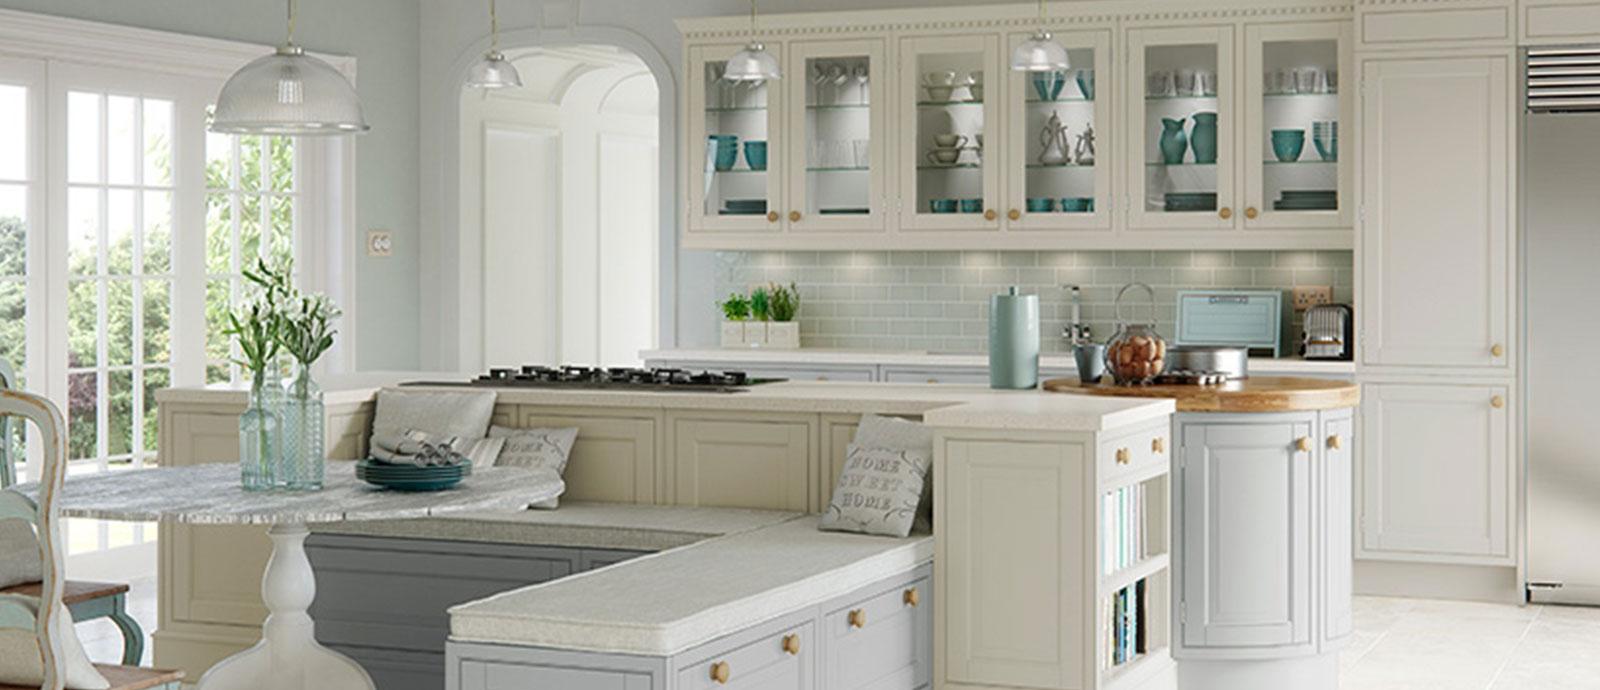 Key Design Elements In An English Kitchen Classic Kitchens Burnhill Blog